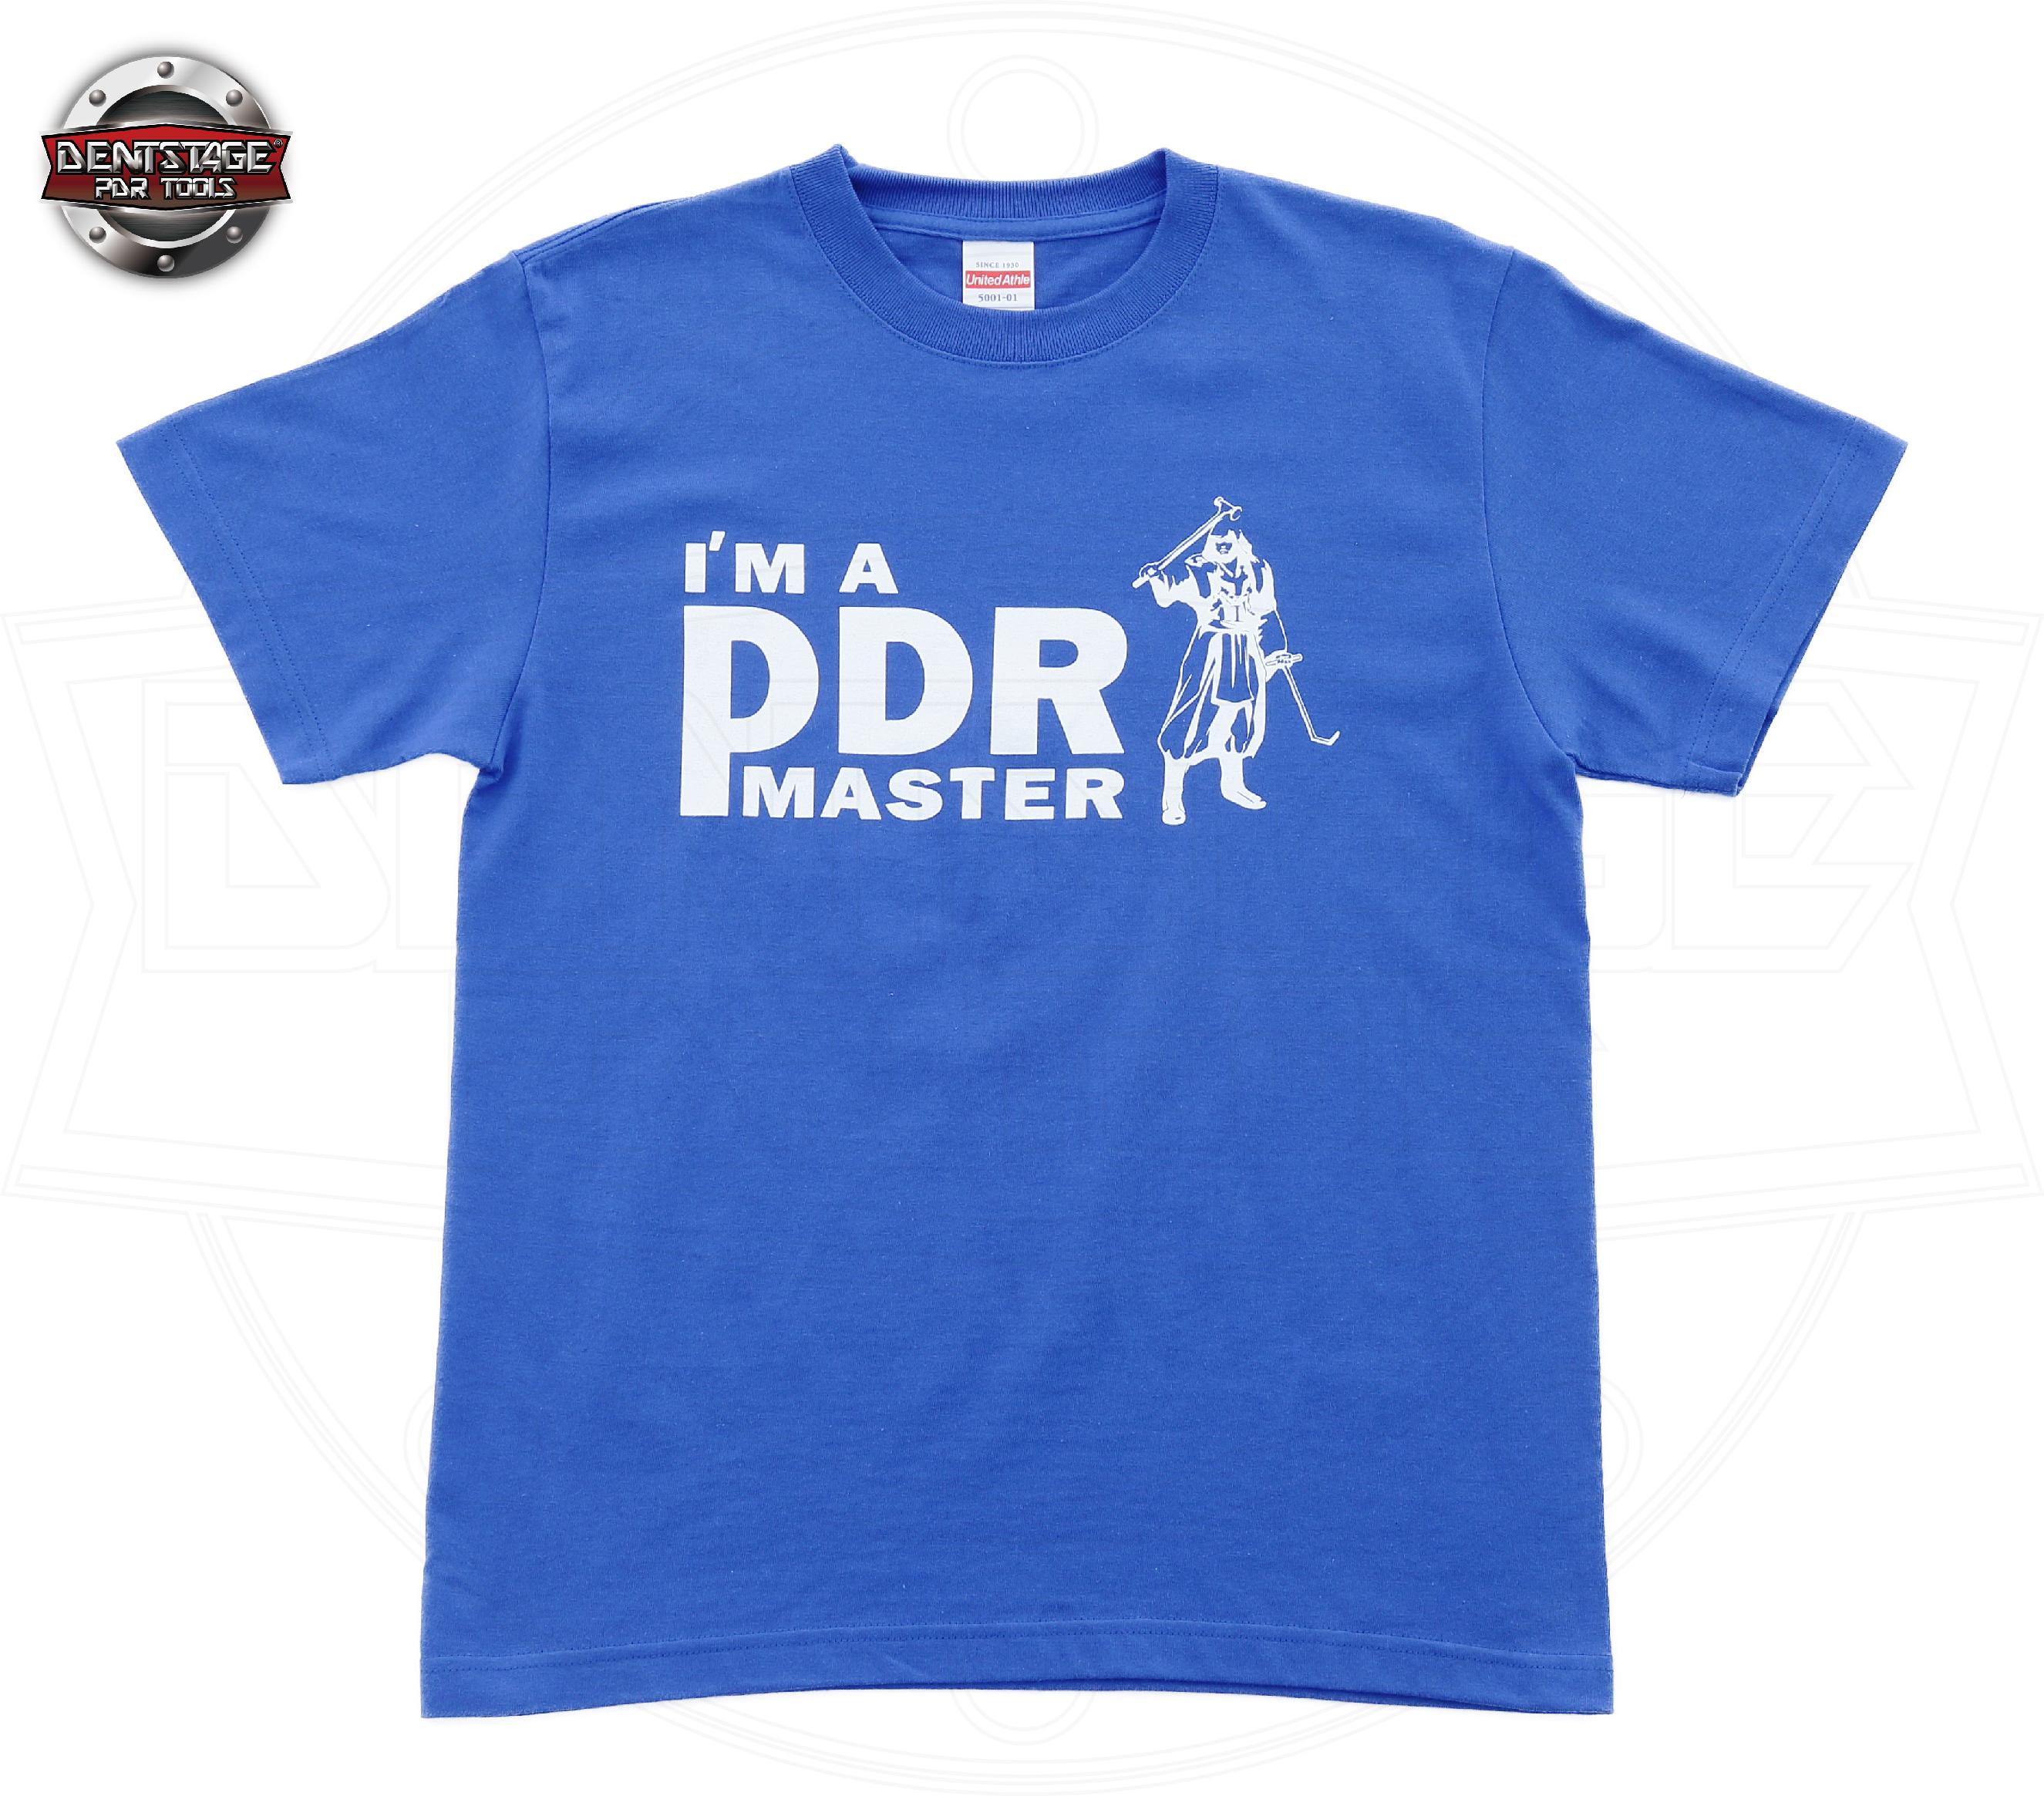 PDR Jedi Master 紀念T恤(藍)-01.jpg